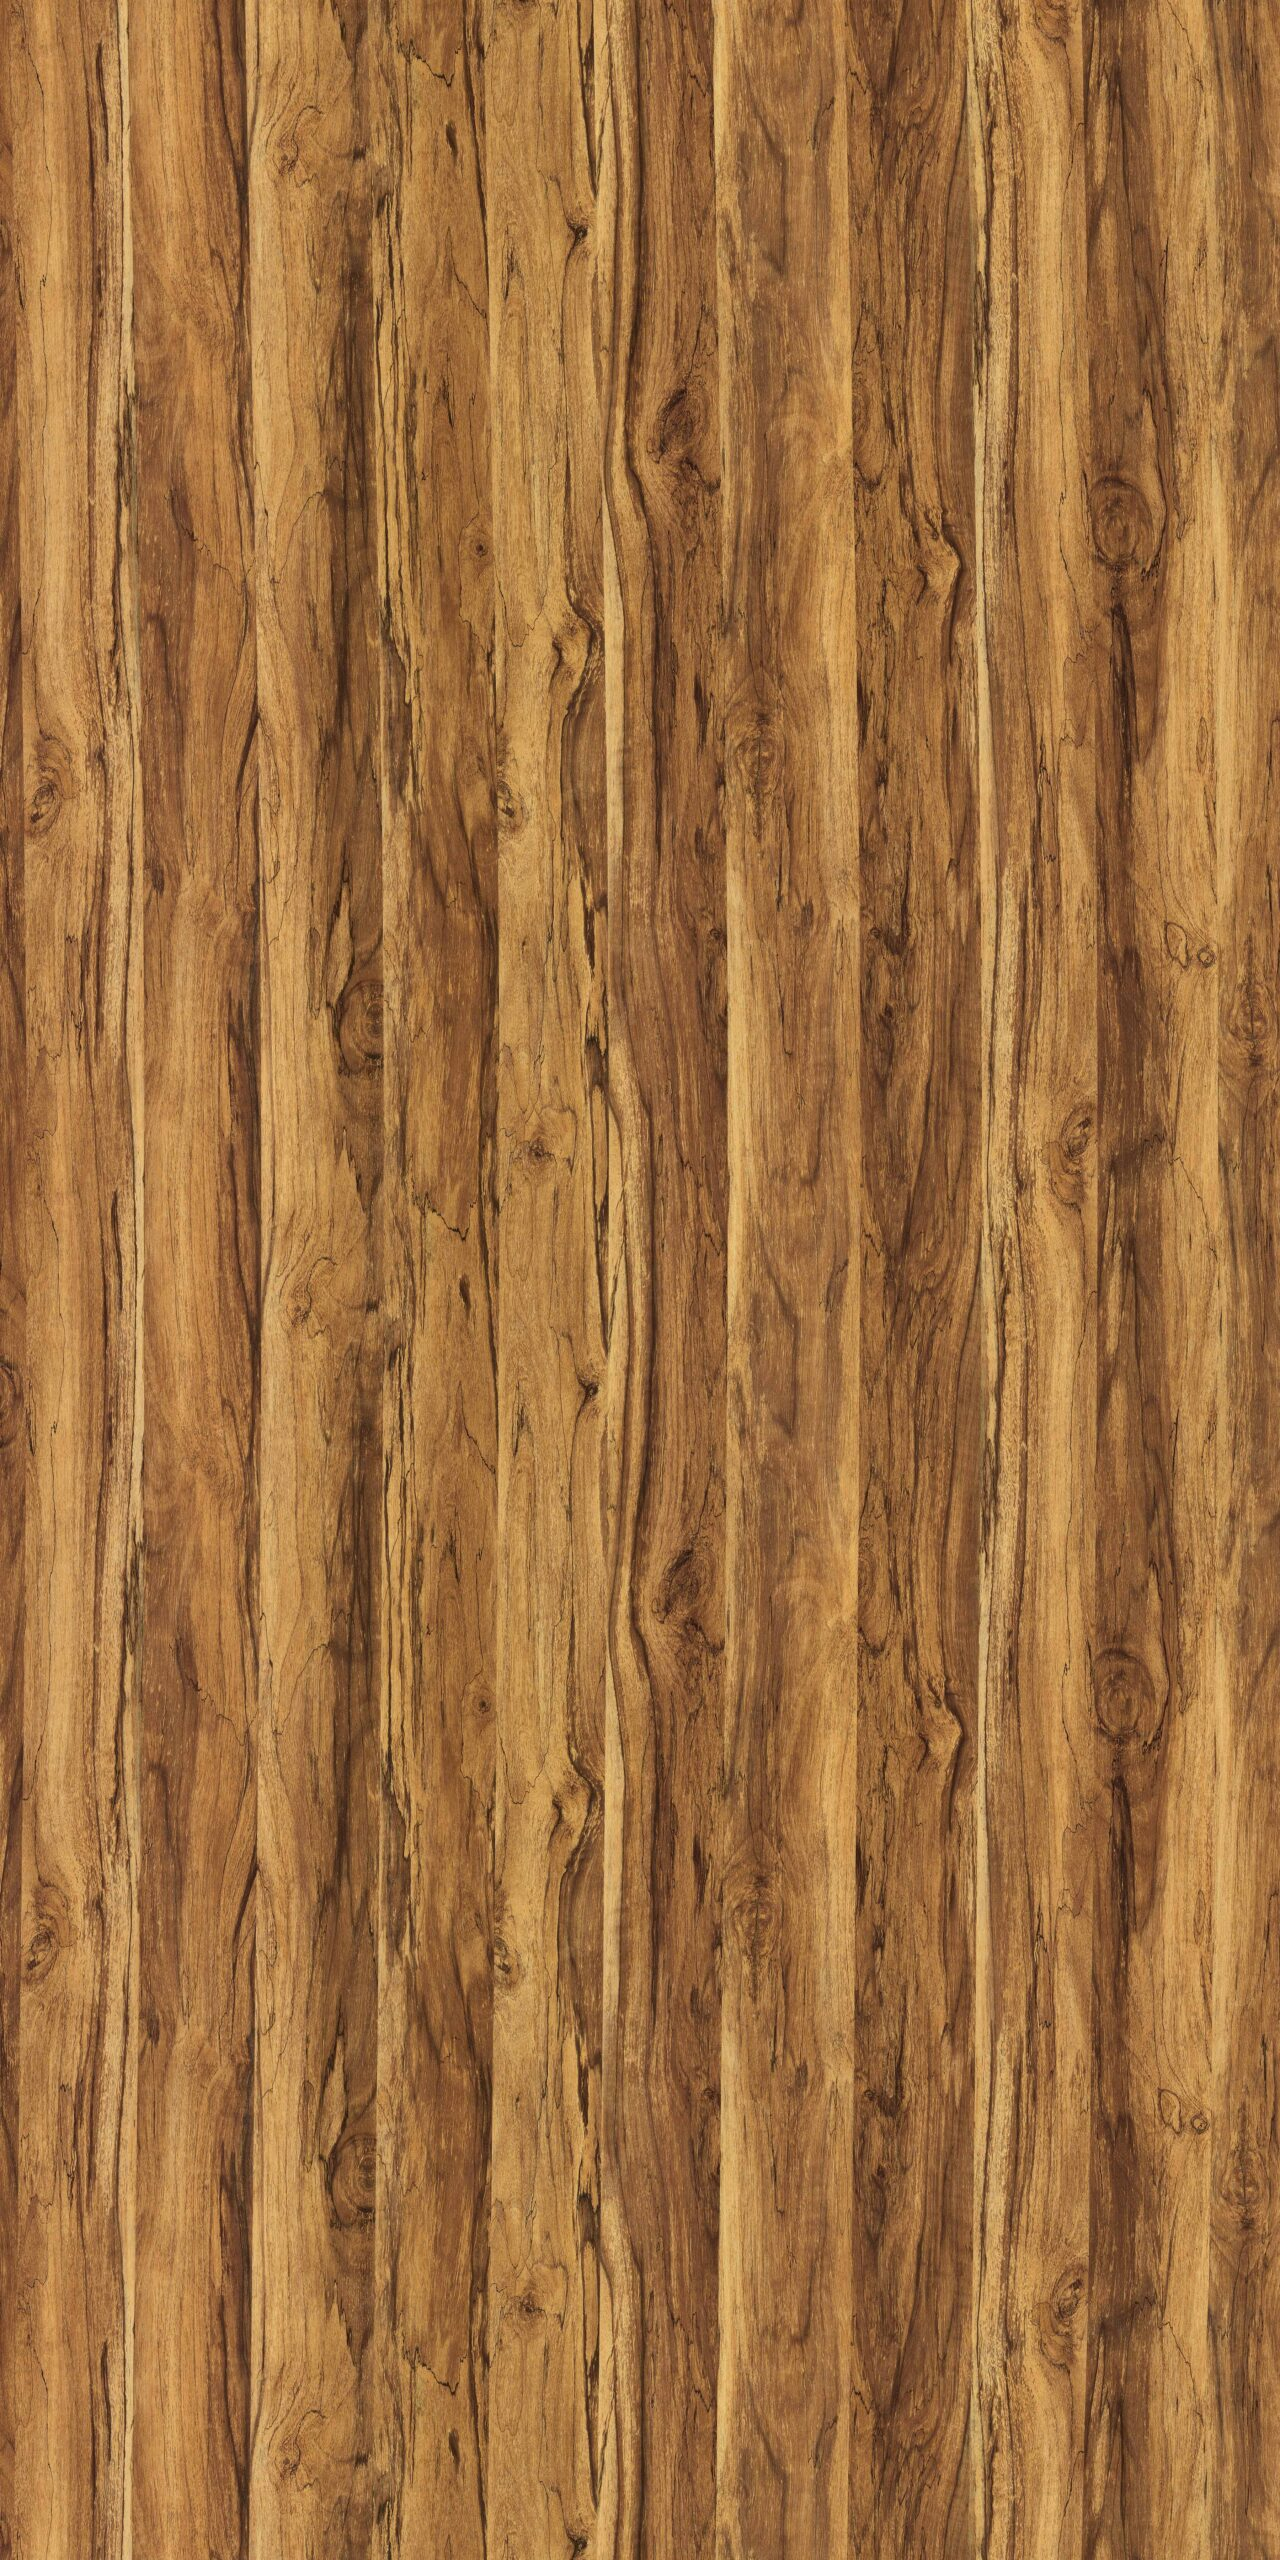 Luxury Laminate Suppliers Near Me Wood Grains 2136